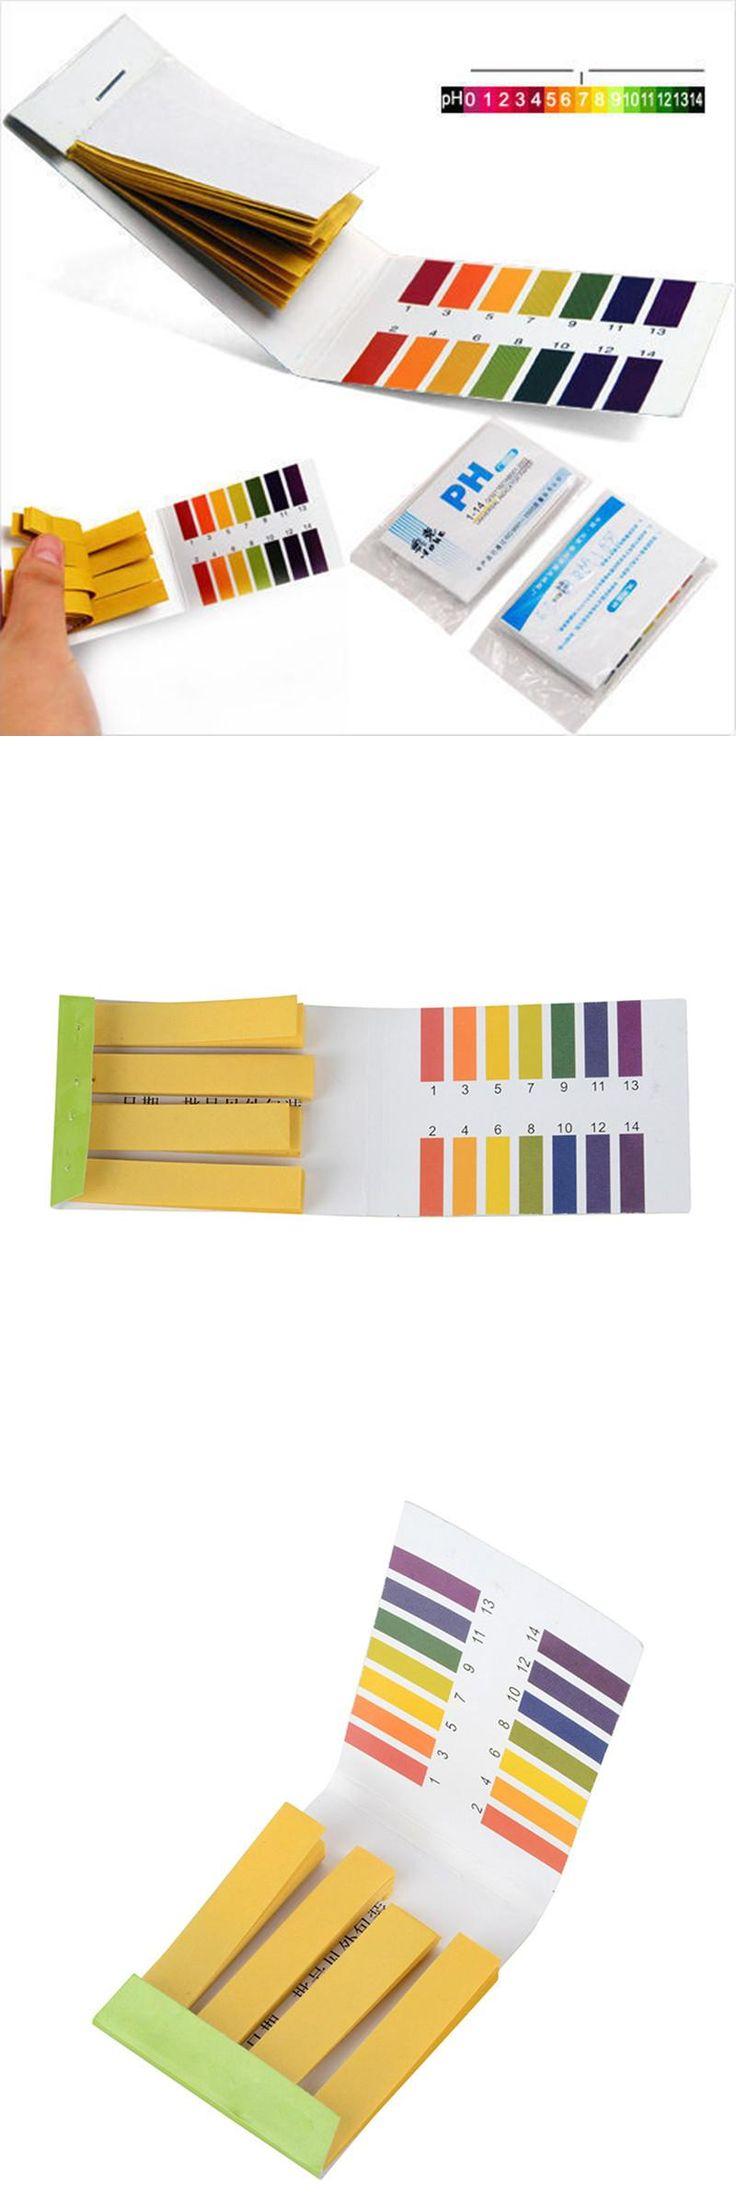 [Visit to Buy] 160pcs PH1-14 Litmus Test Urine Saliva Tester Test Paper Strips Scale Indicator DIY Litmus Testing Tools #Advertisement